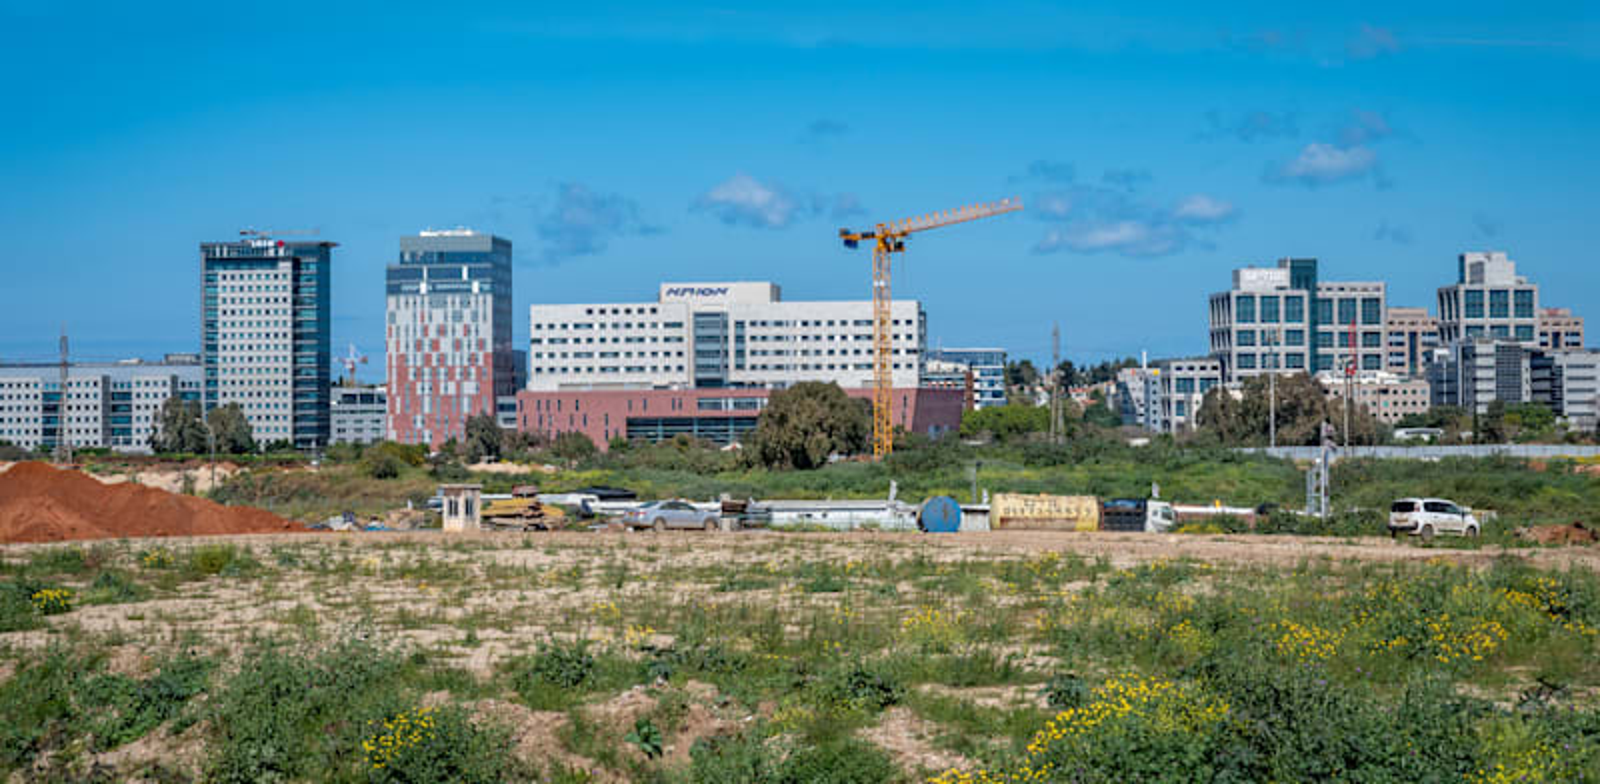 Tel Aviv's Ramat Hahayal Photo: Shutterstock